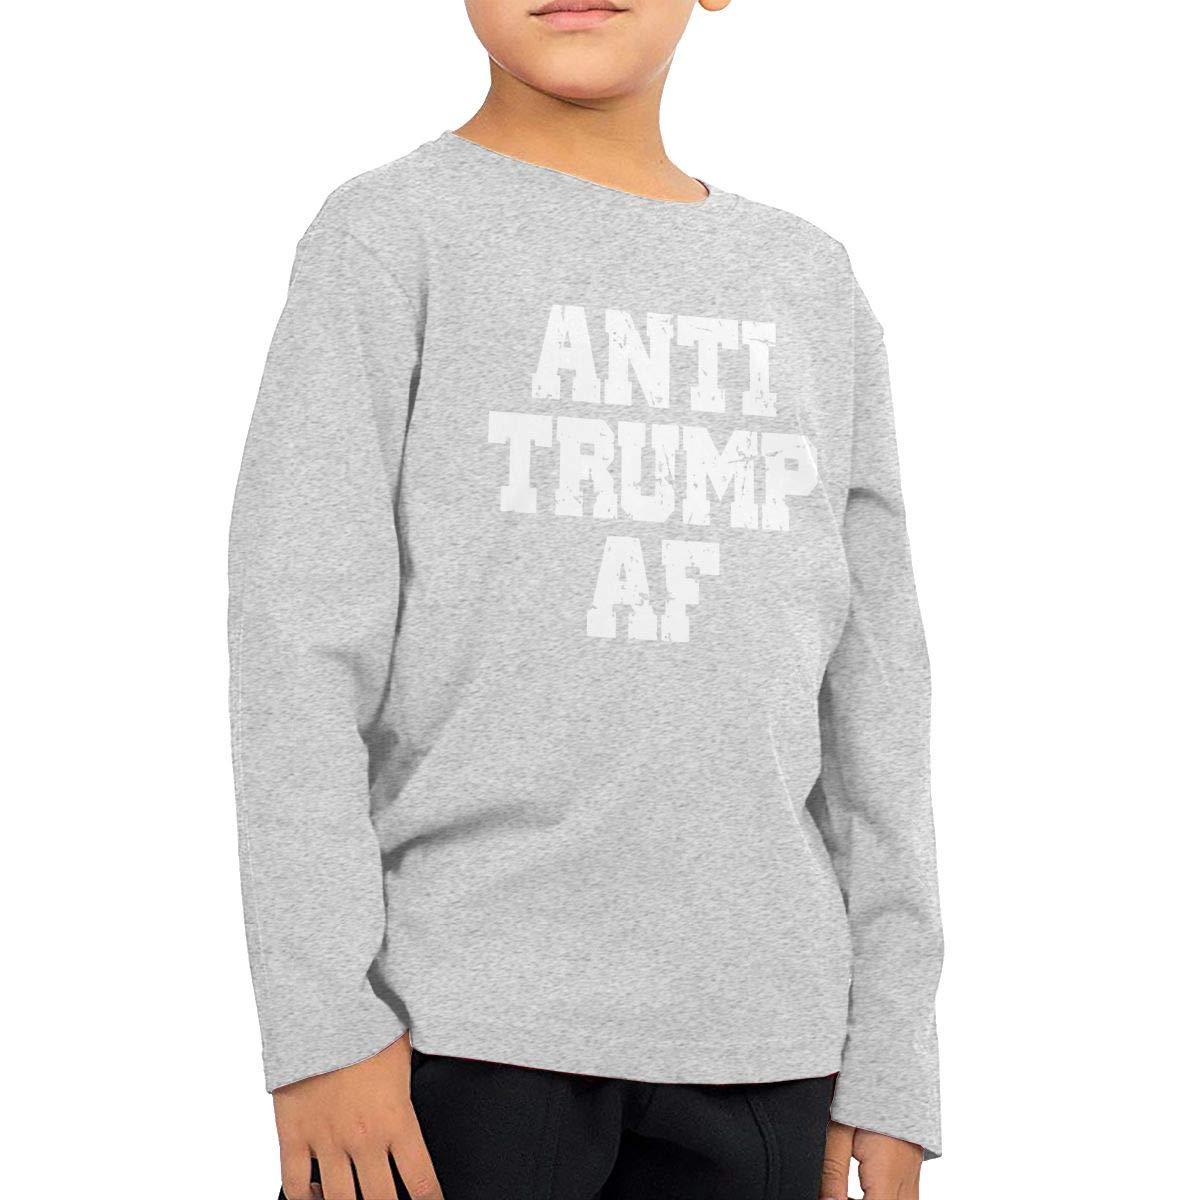 HADYKIDSLOVE Anti Trump AF Kids T-Shirt Long Sleeve Boys Girls T-Shirt